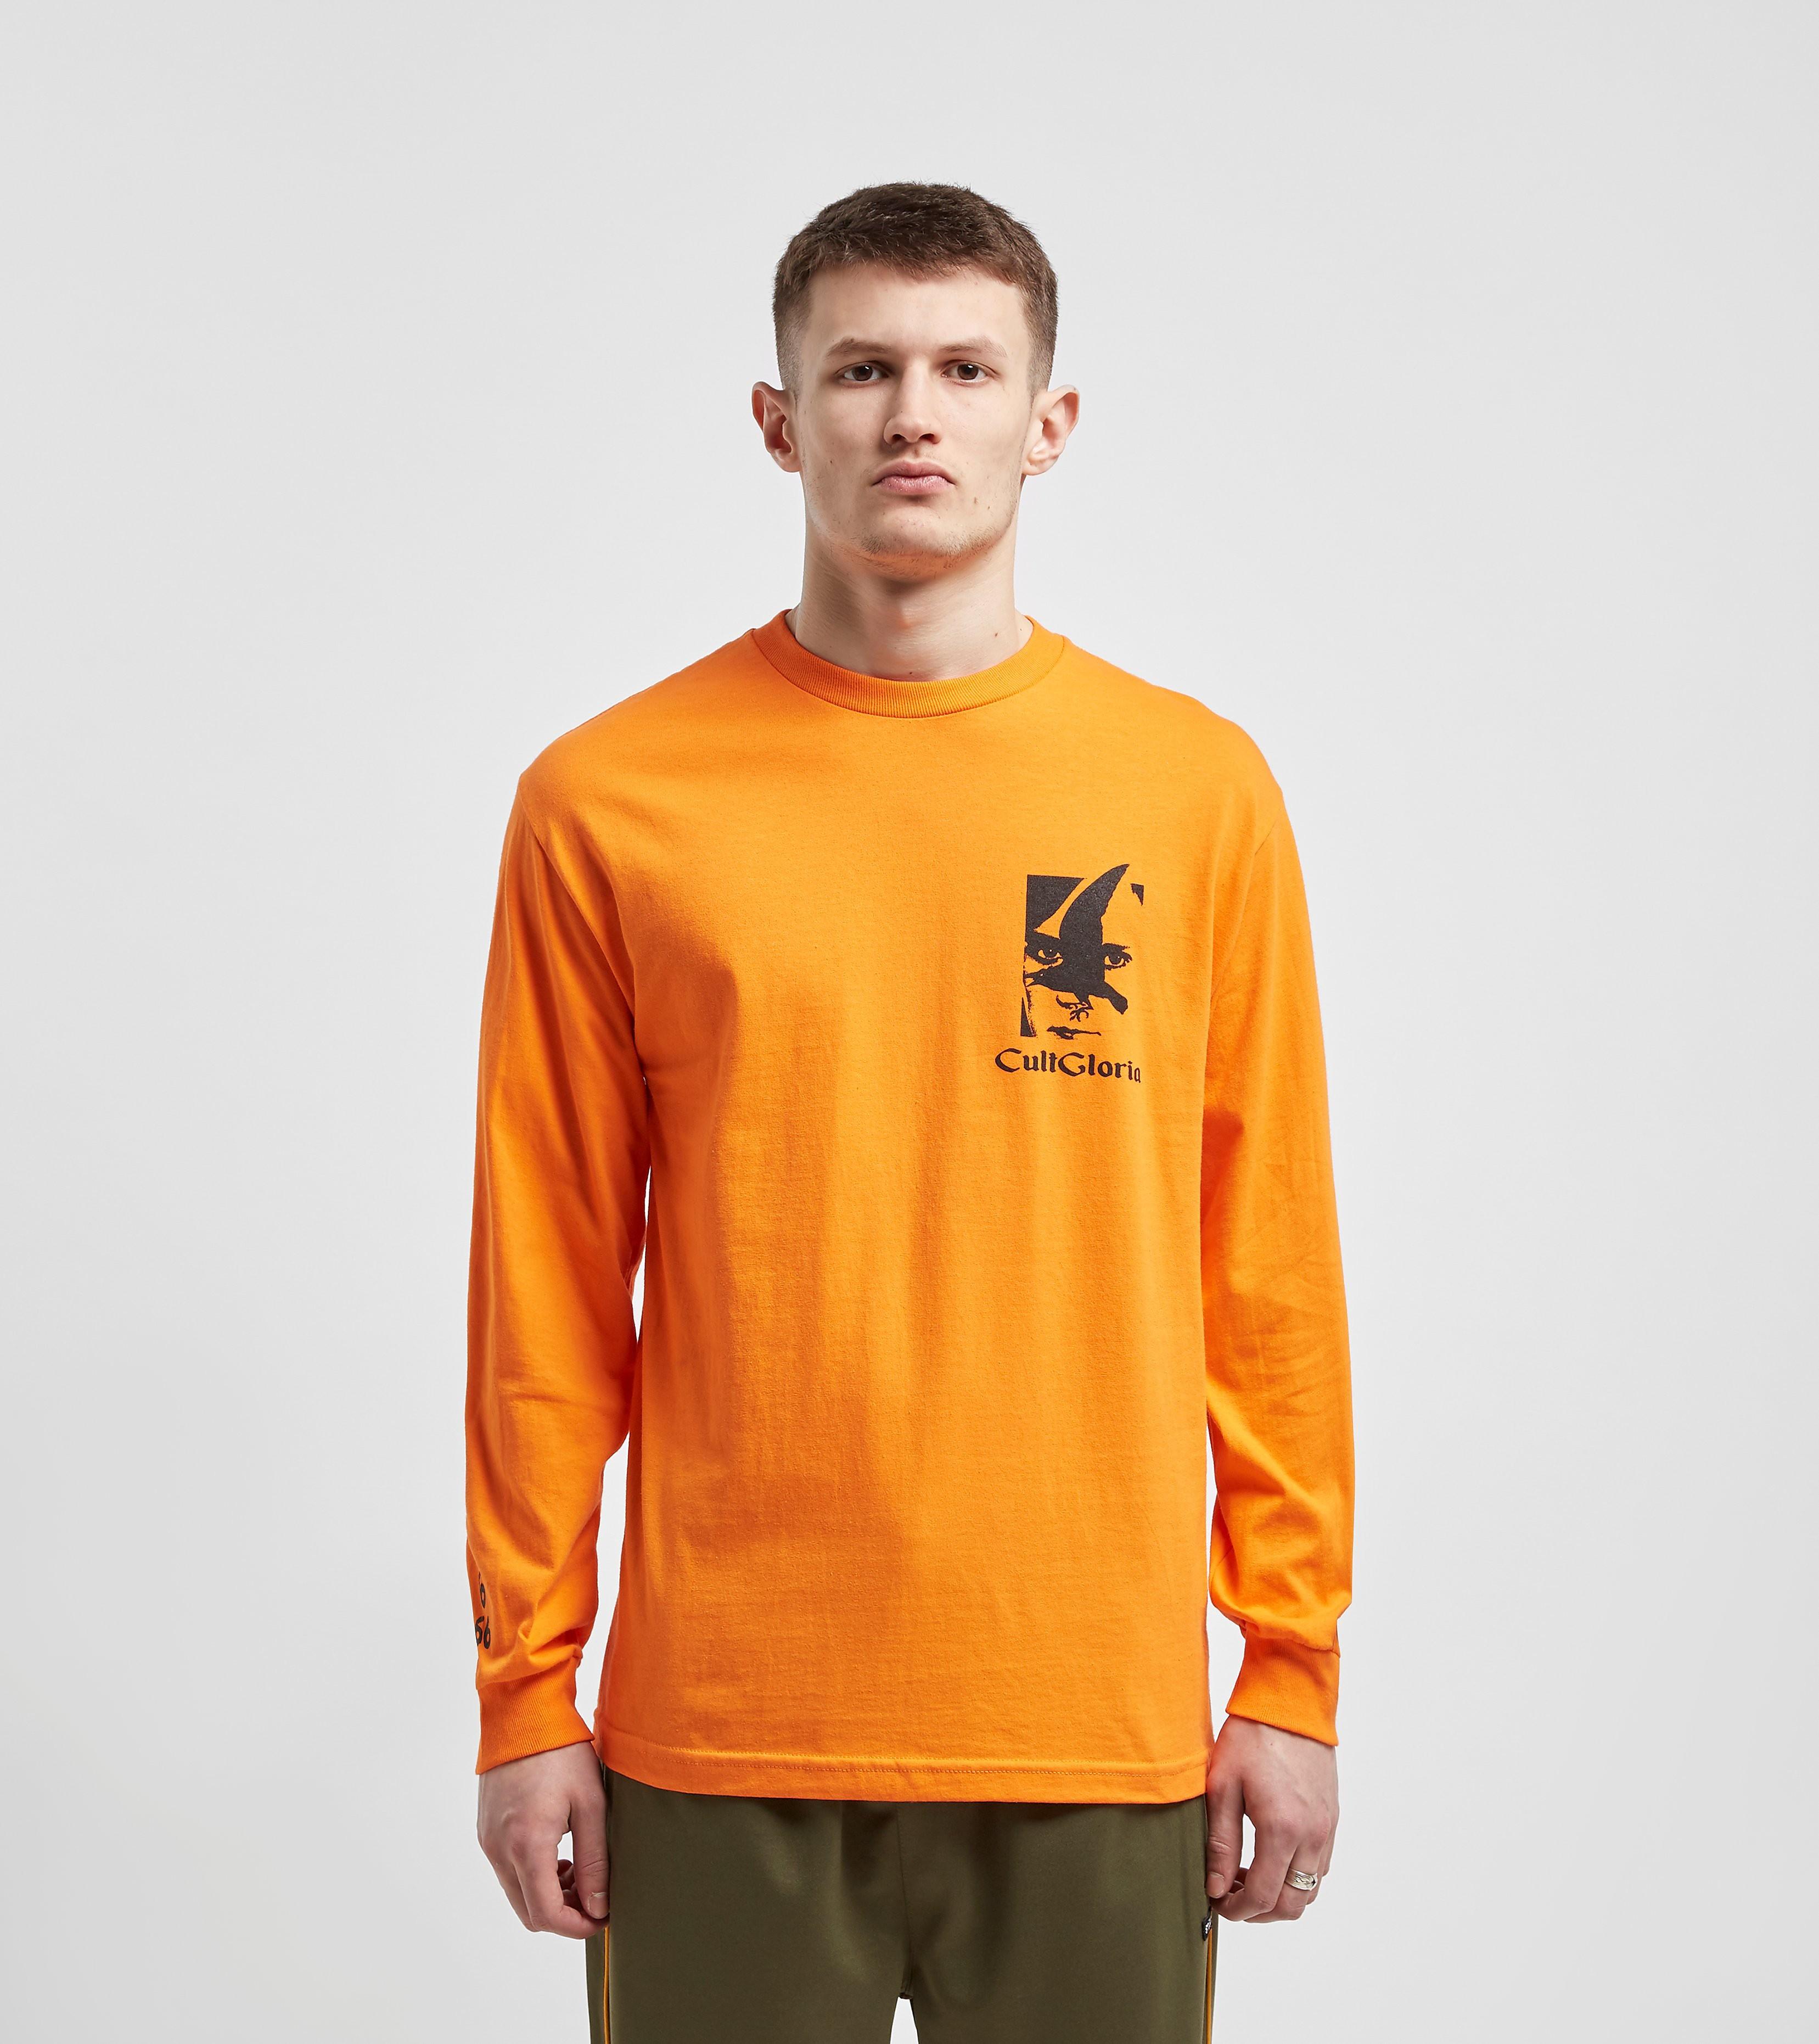 Cult Gloria T-Shirt à Manches Longues Omen, Orange